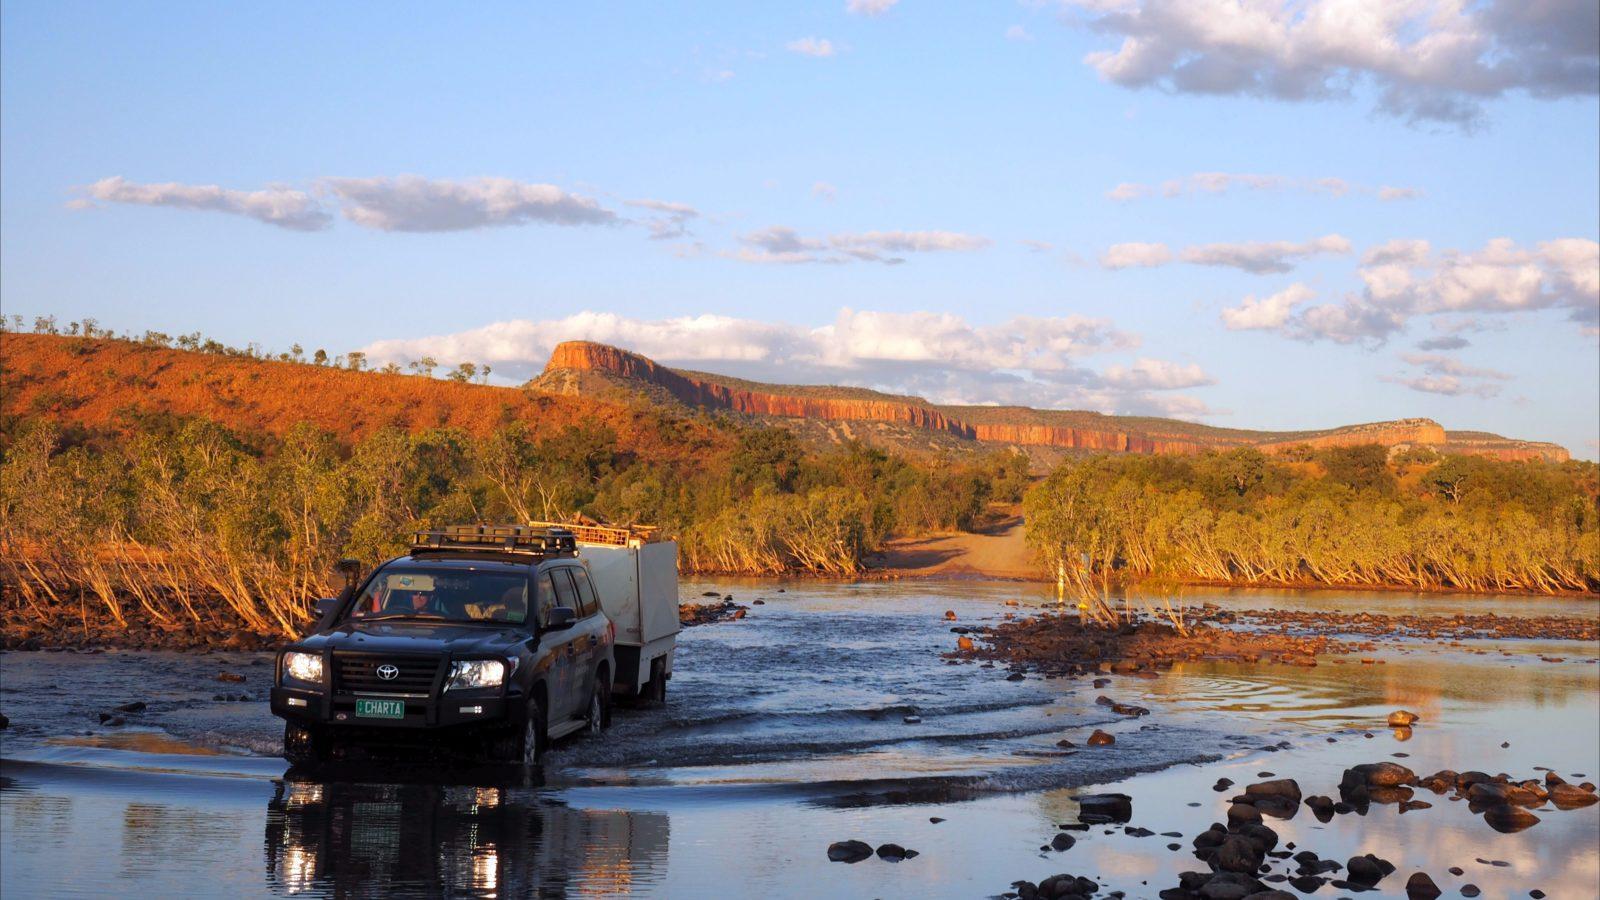 Charter North 4WD Safaris, Kununurra, Western Australia